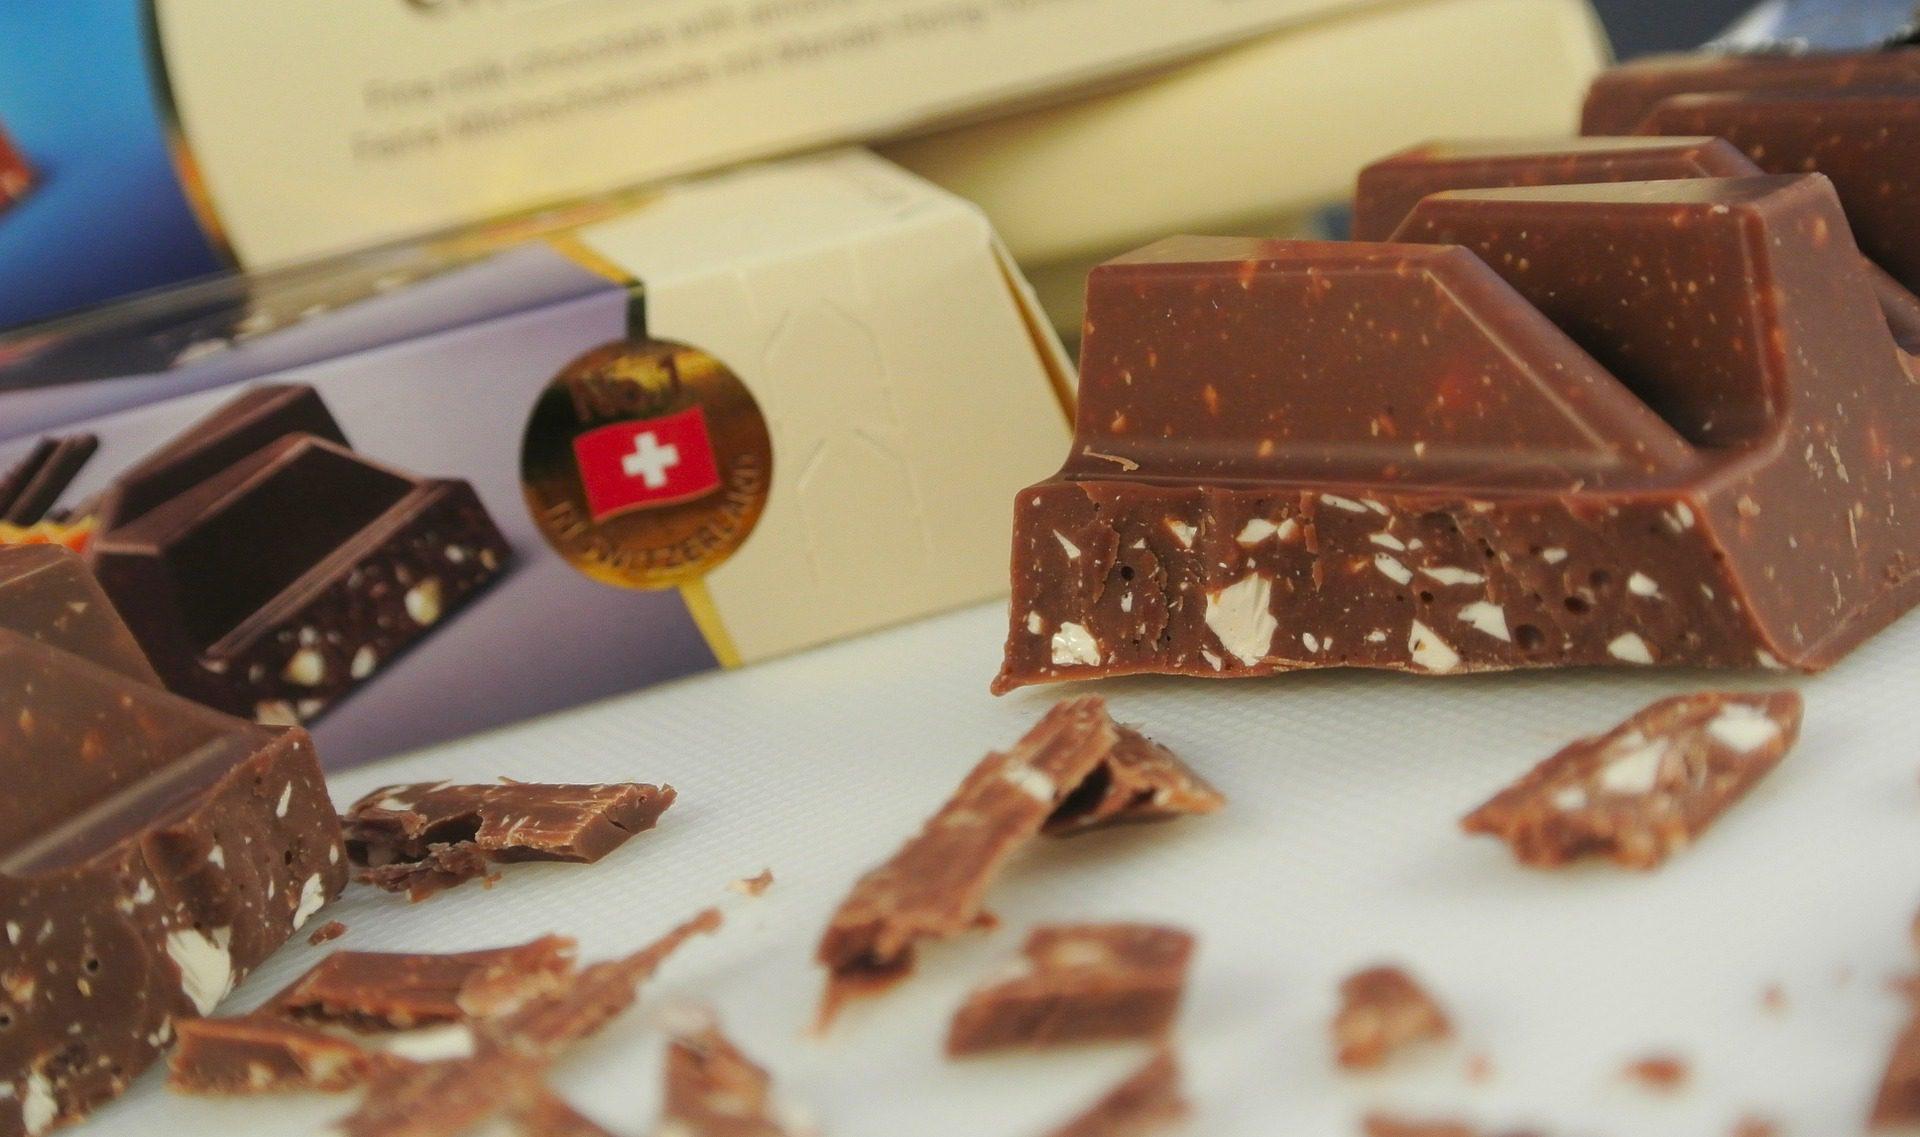 Swiss chocolate and online tutoring